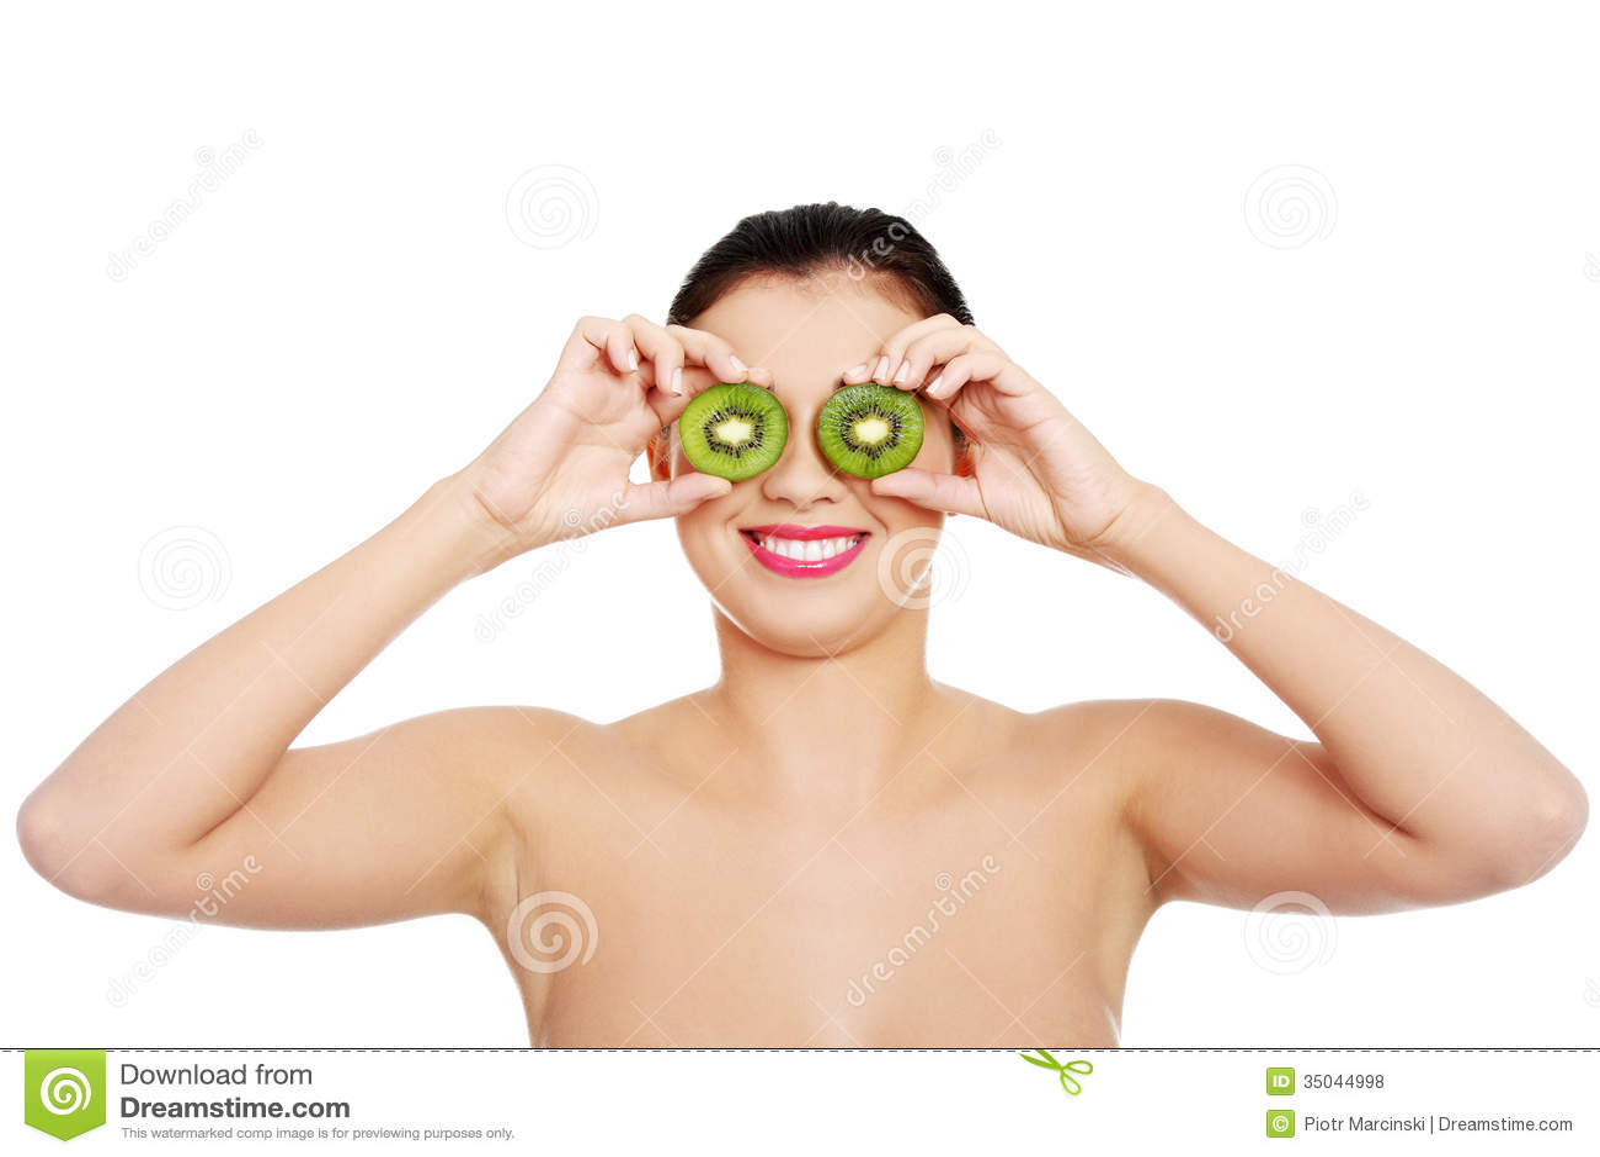 Kiwi Mädchen nackt pic